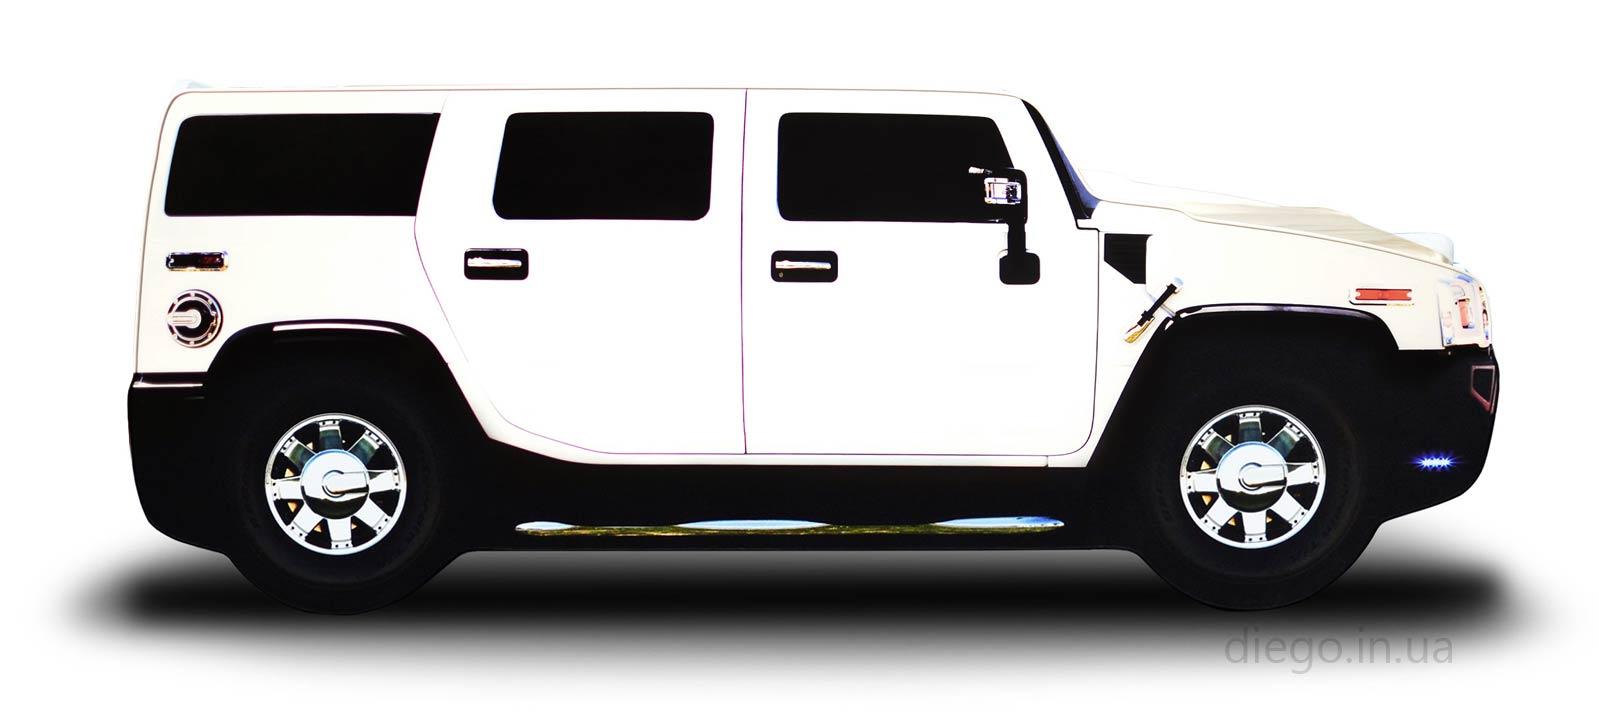 Джип белого цвета